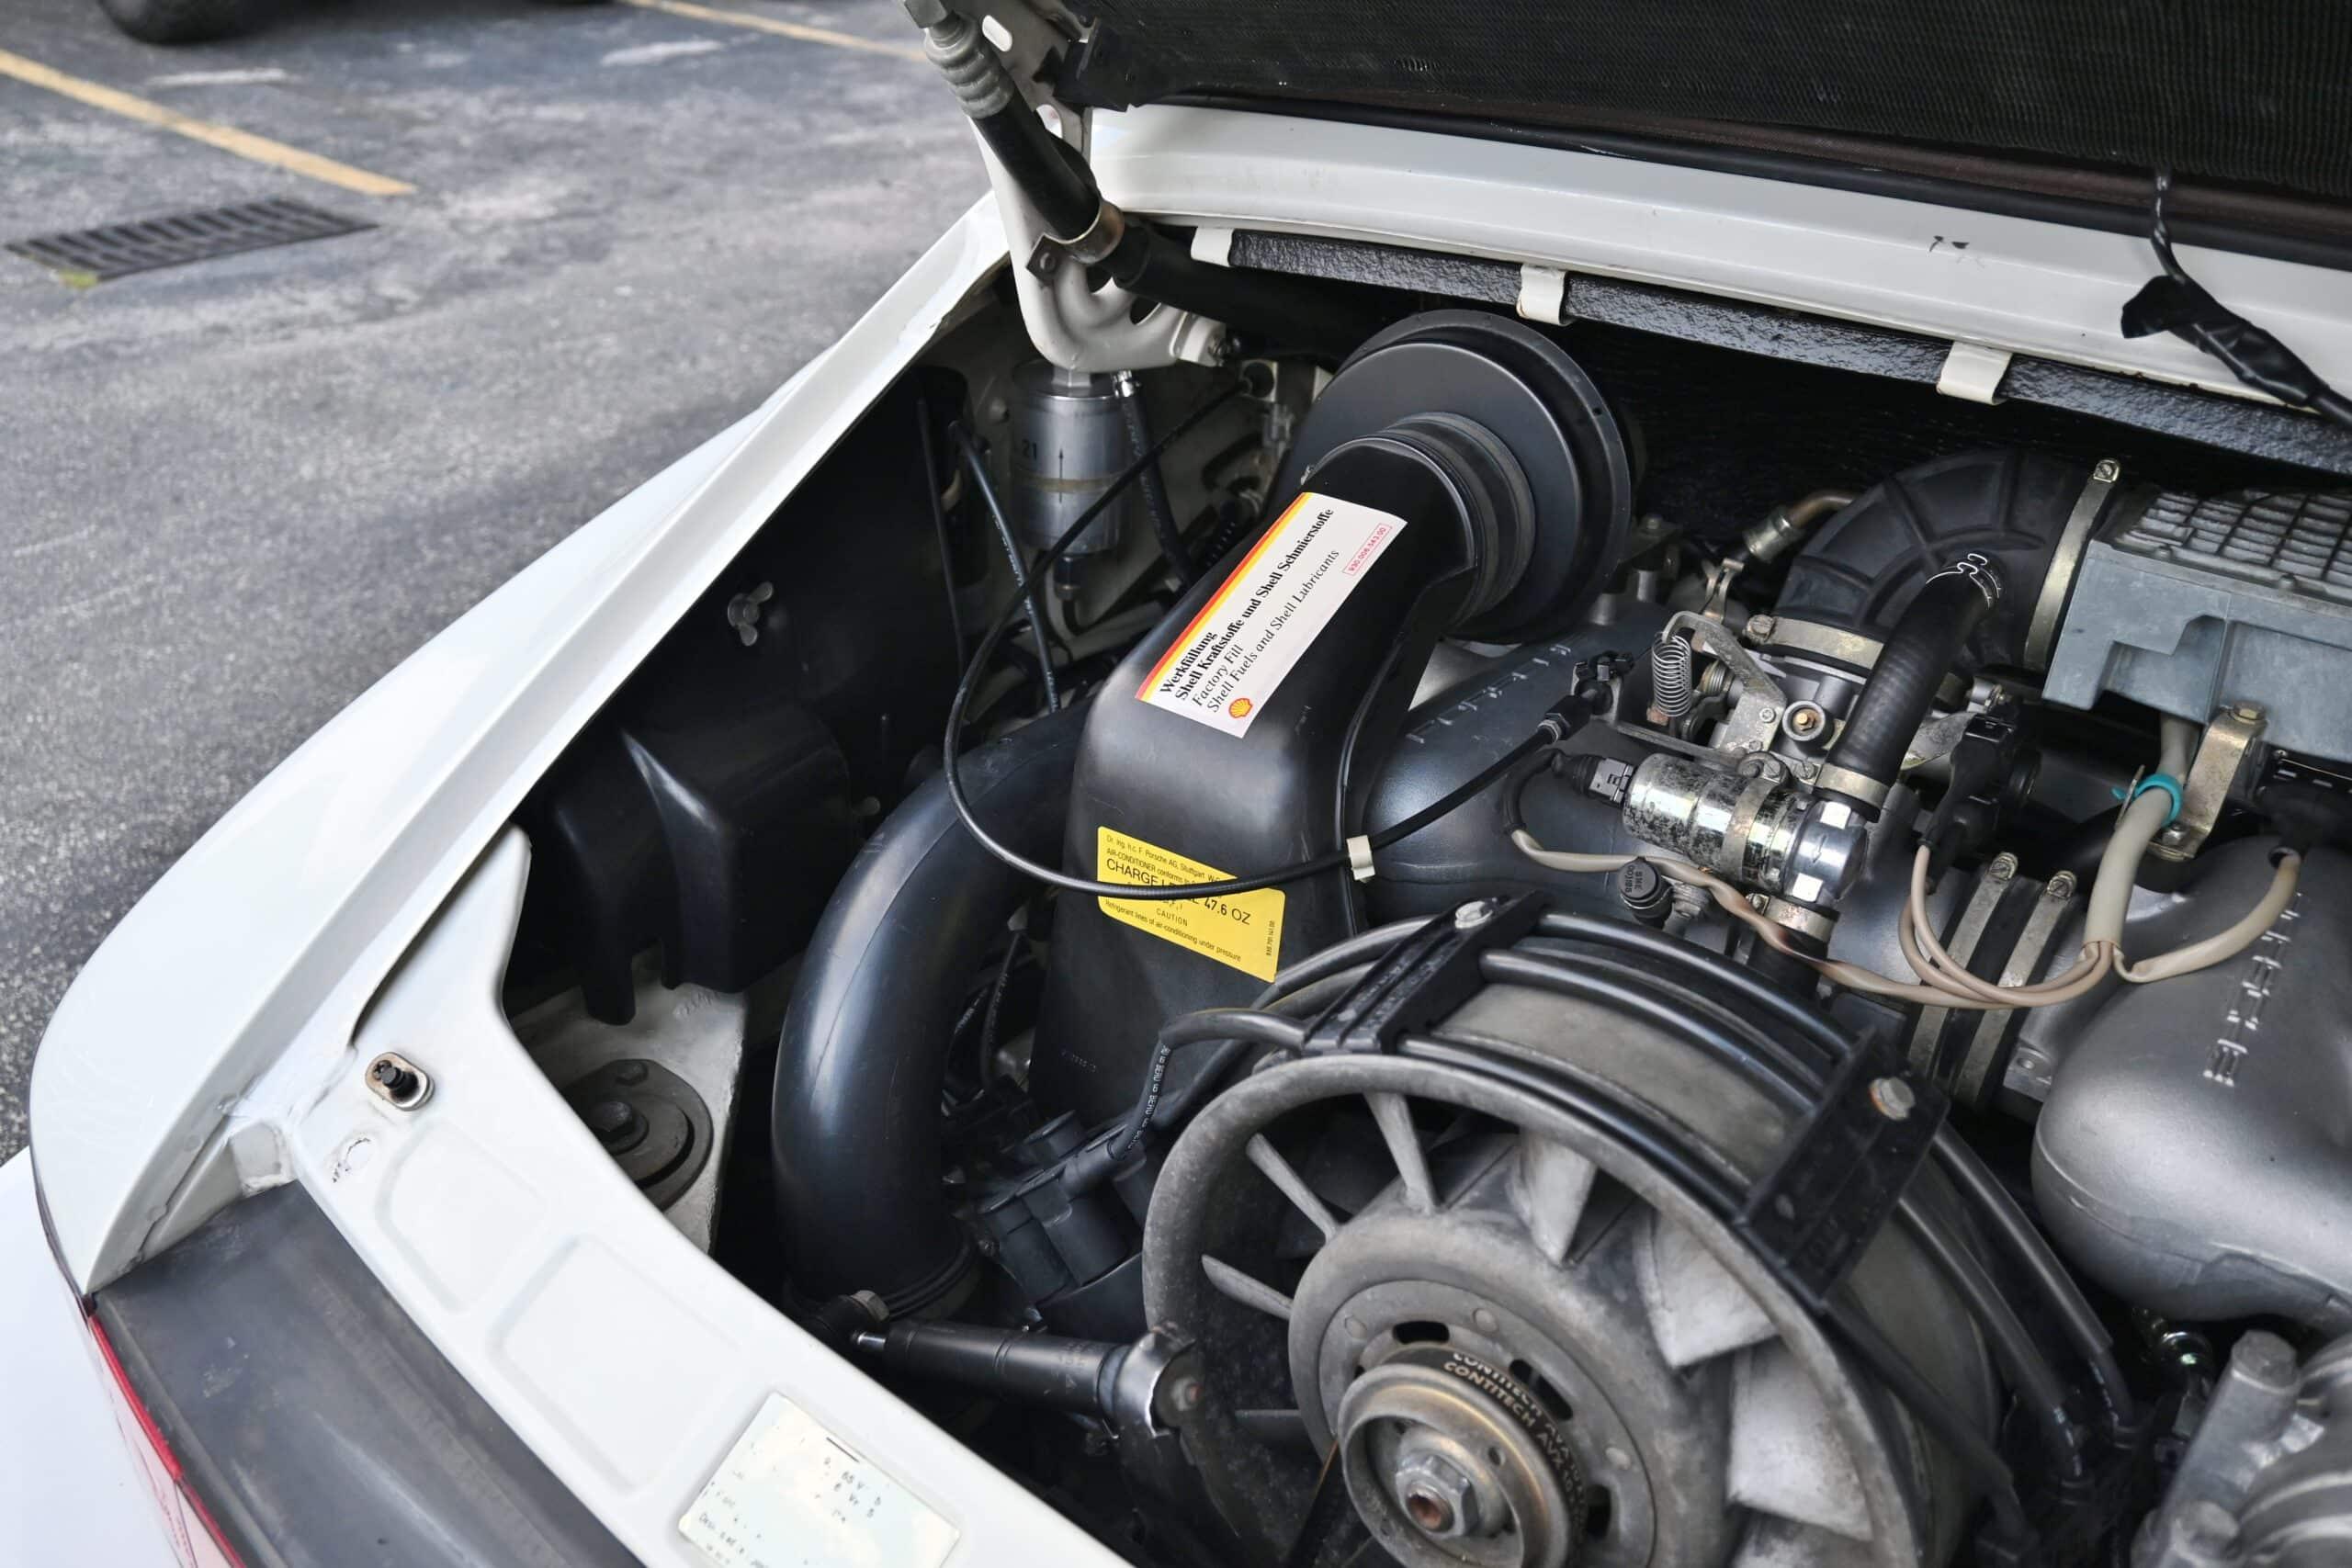 1988 Porsche 911 Slant nose Turbo Look All metal widebody- G50 5 speed Manual – Recaro Seats – Major service just done